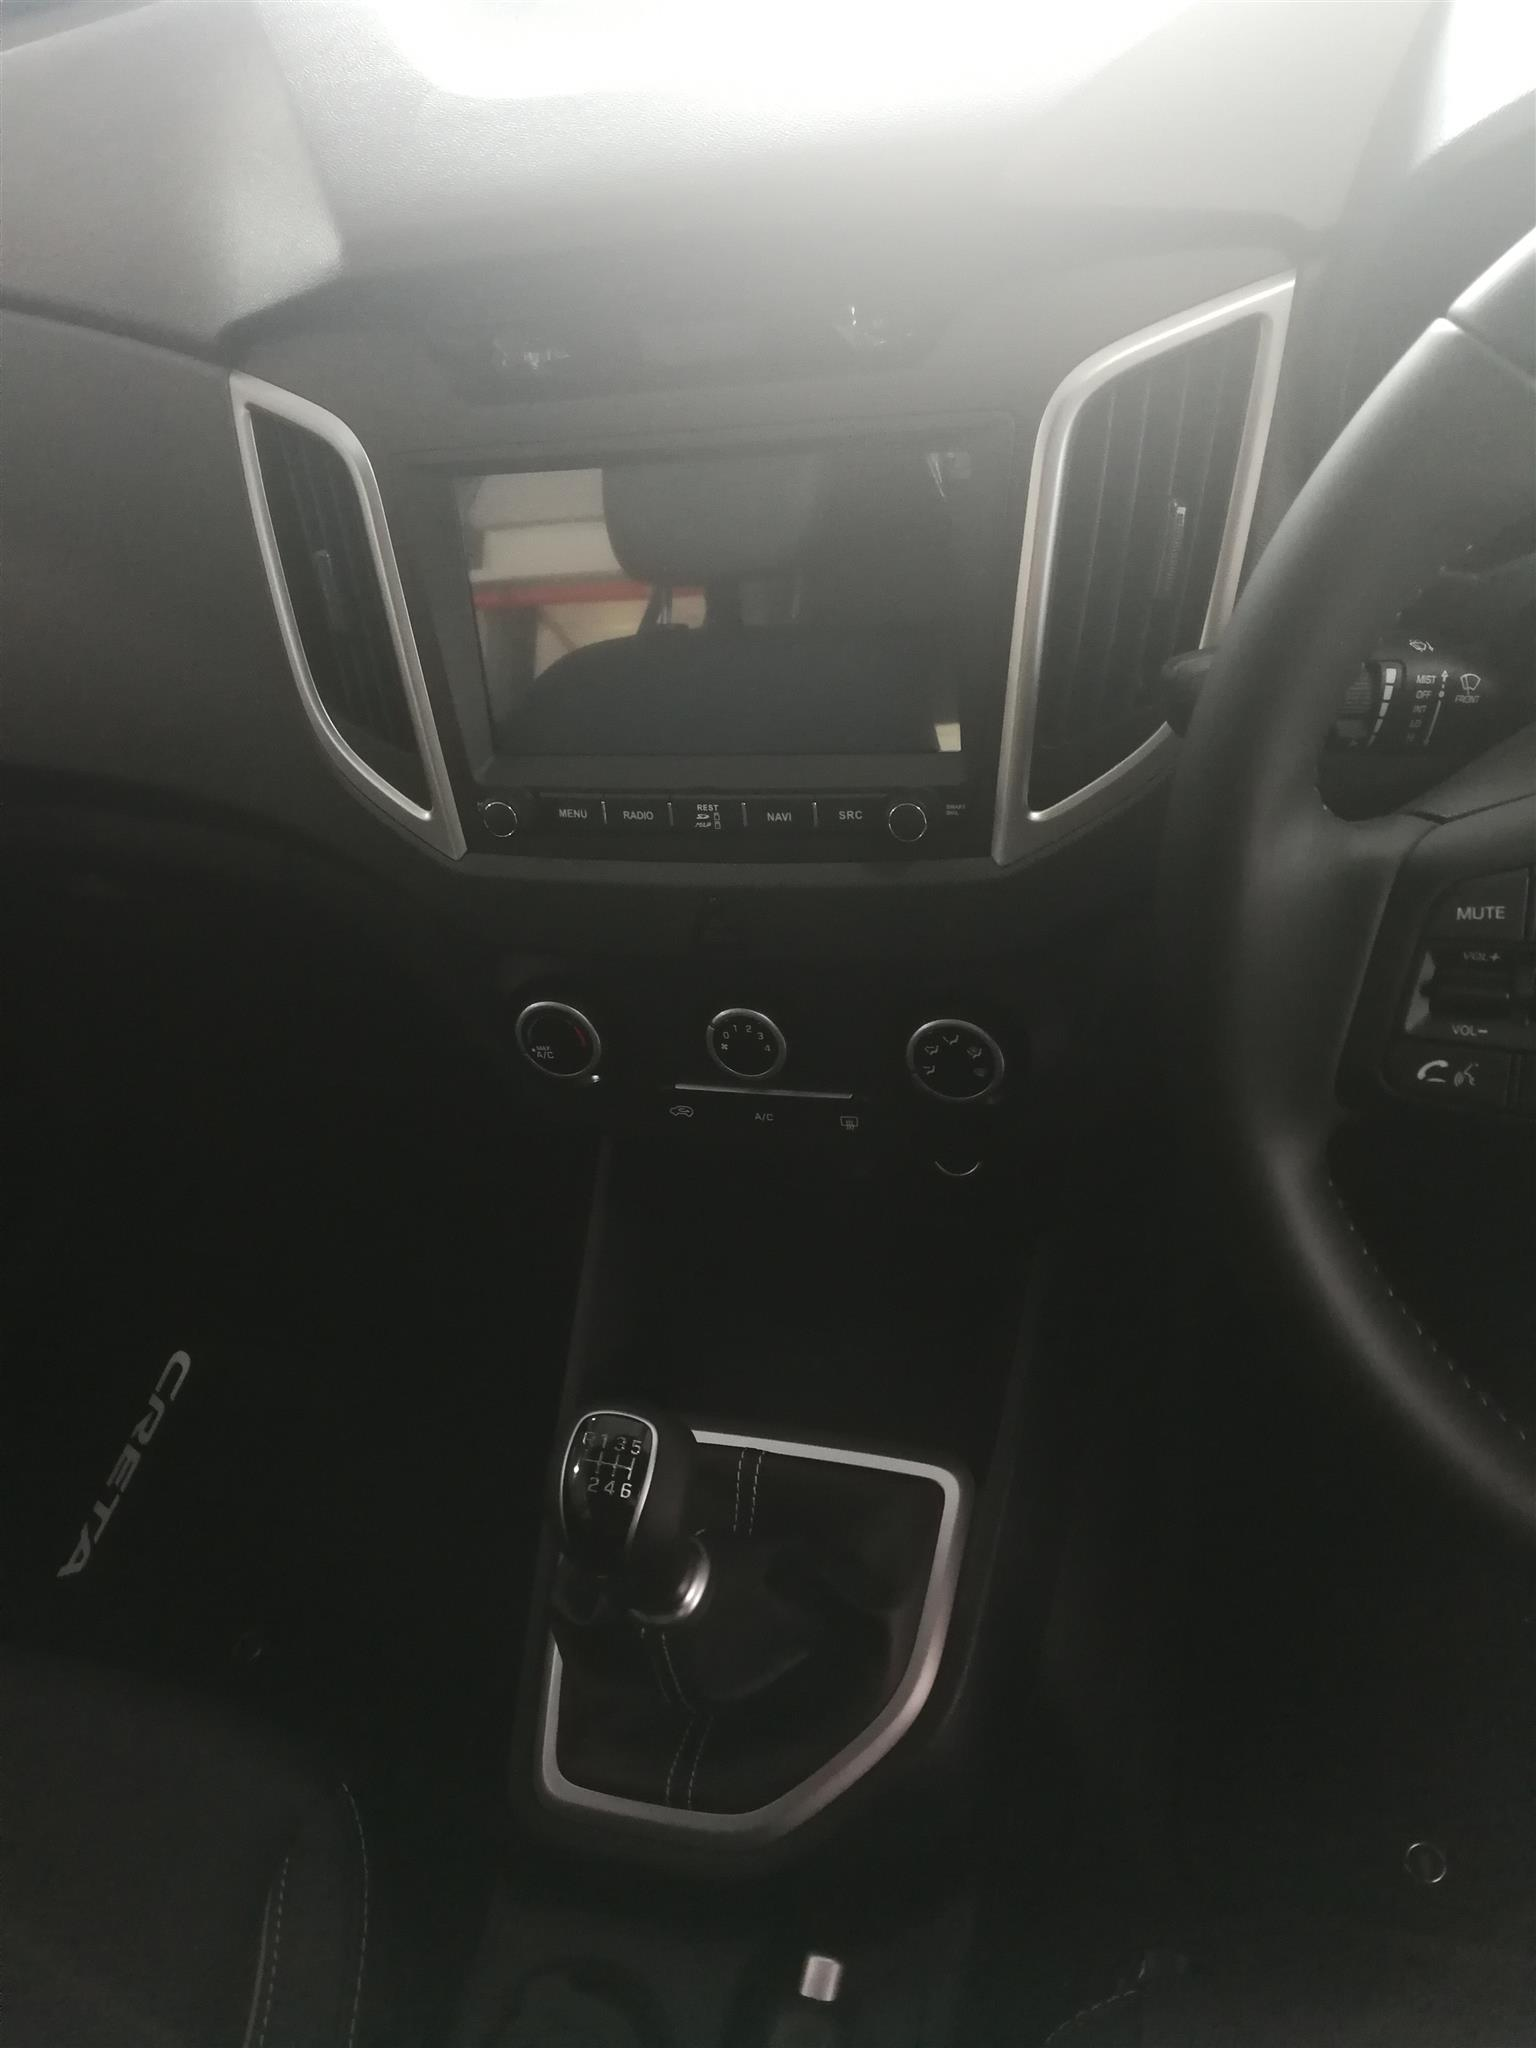 2018 Hyundai Creta 16 Executive Auto Junk Mail